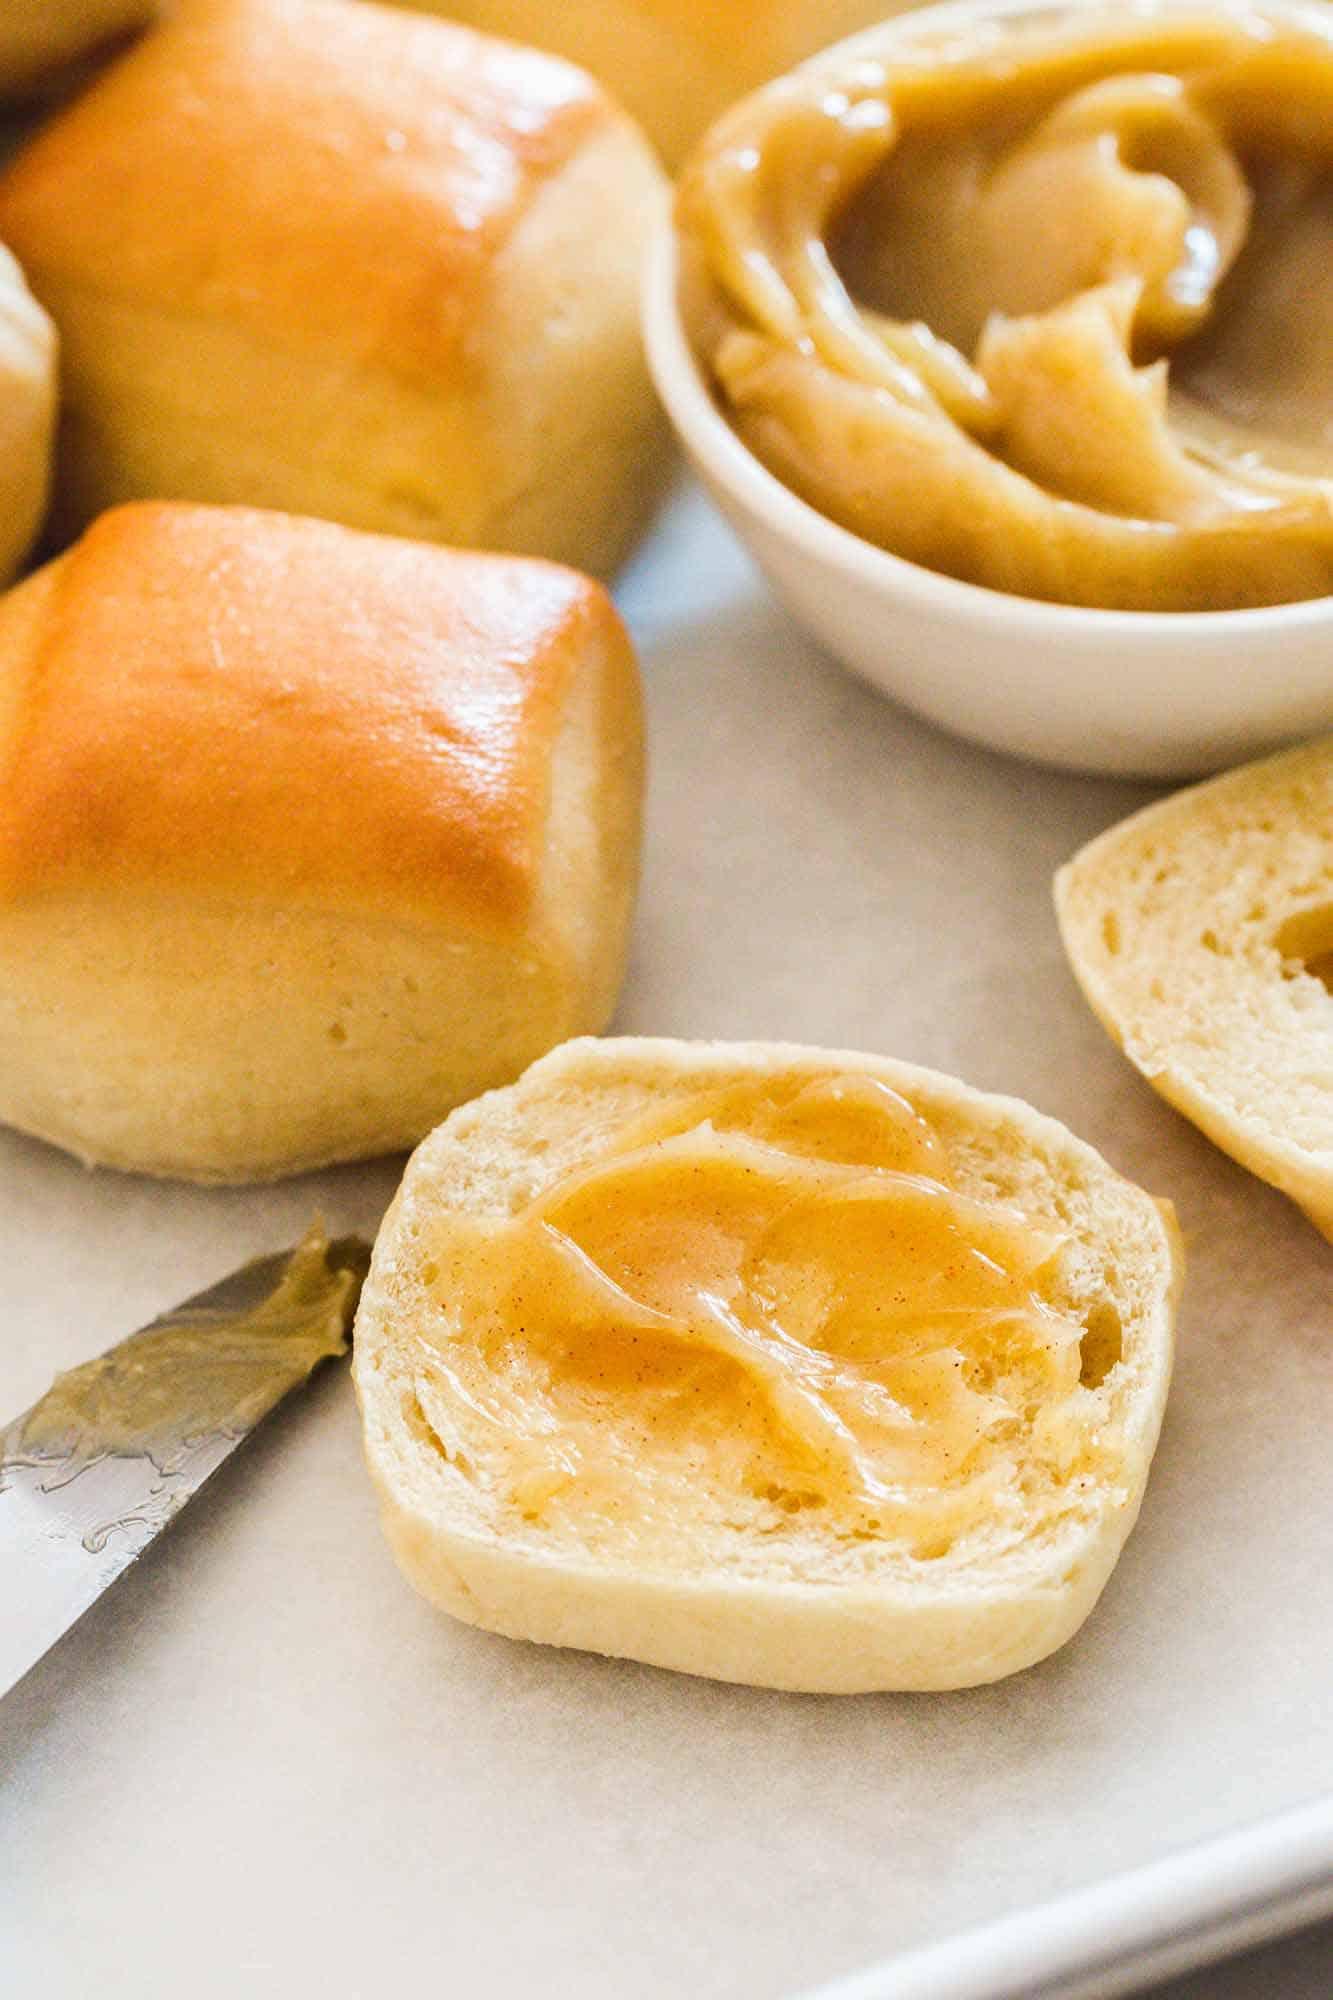 Fresh rolls with cinnamon honey butter spreaded